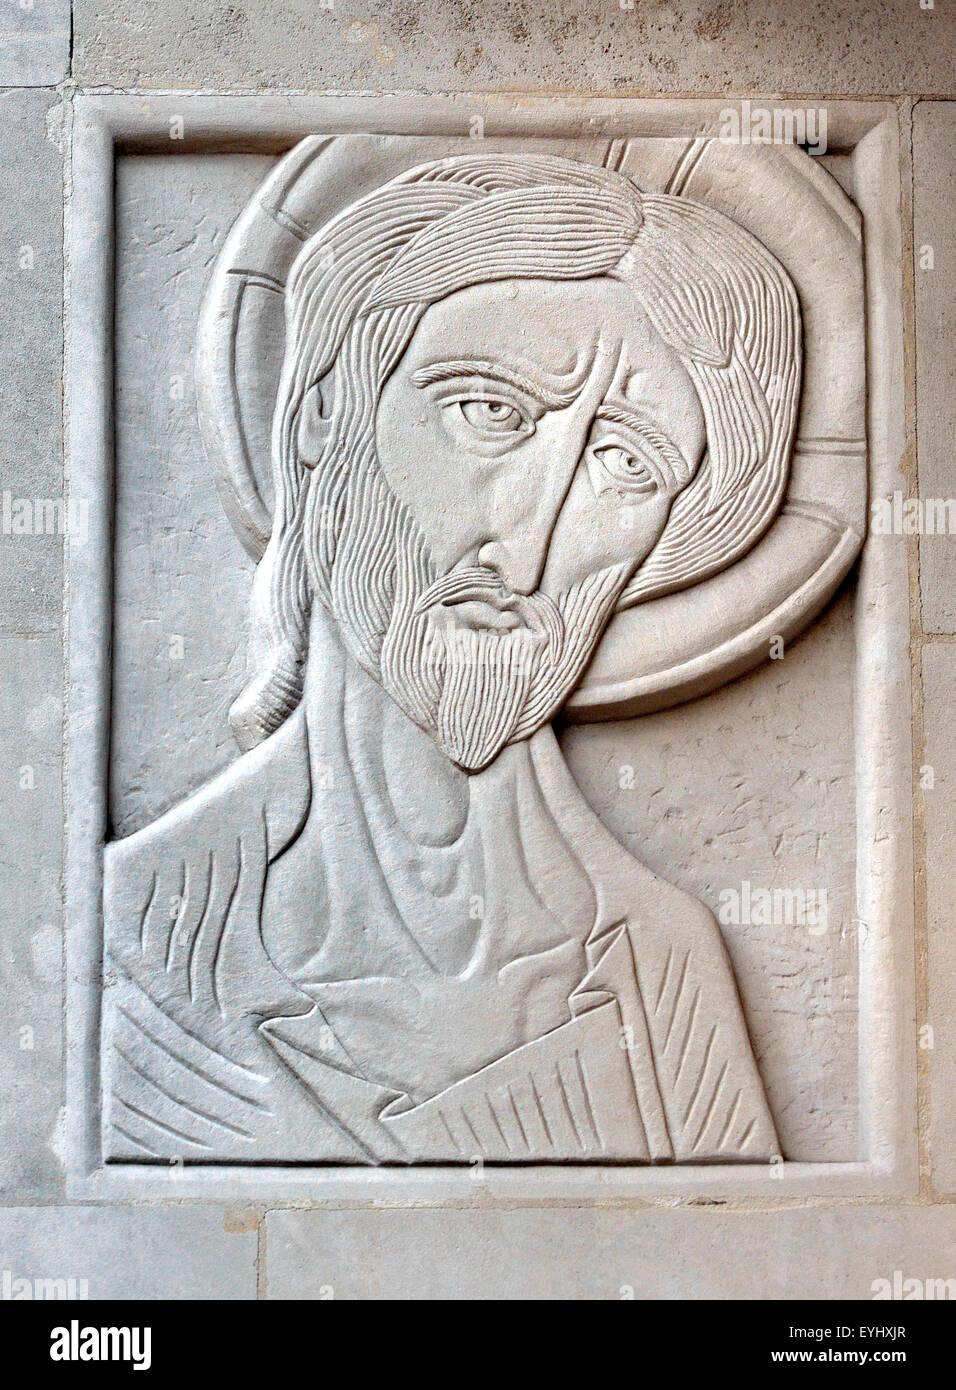 London, England, UK. St Martin's School of Art, Charing Cross Rd.  Carved stone panel by Adolfine Ryland: St - Stock Image